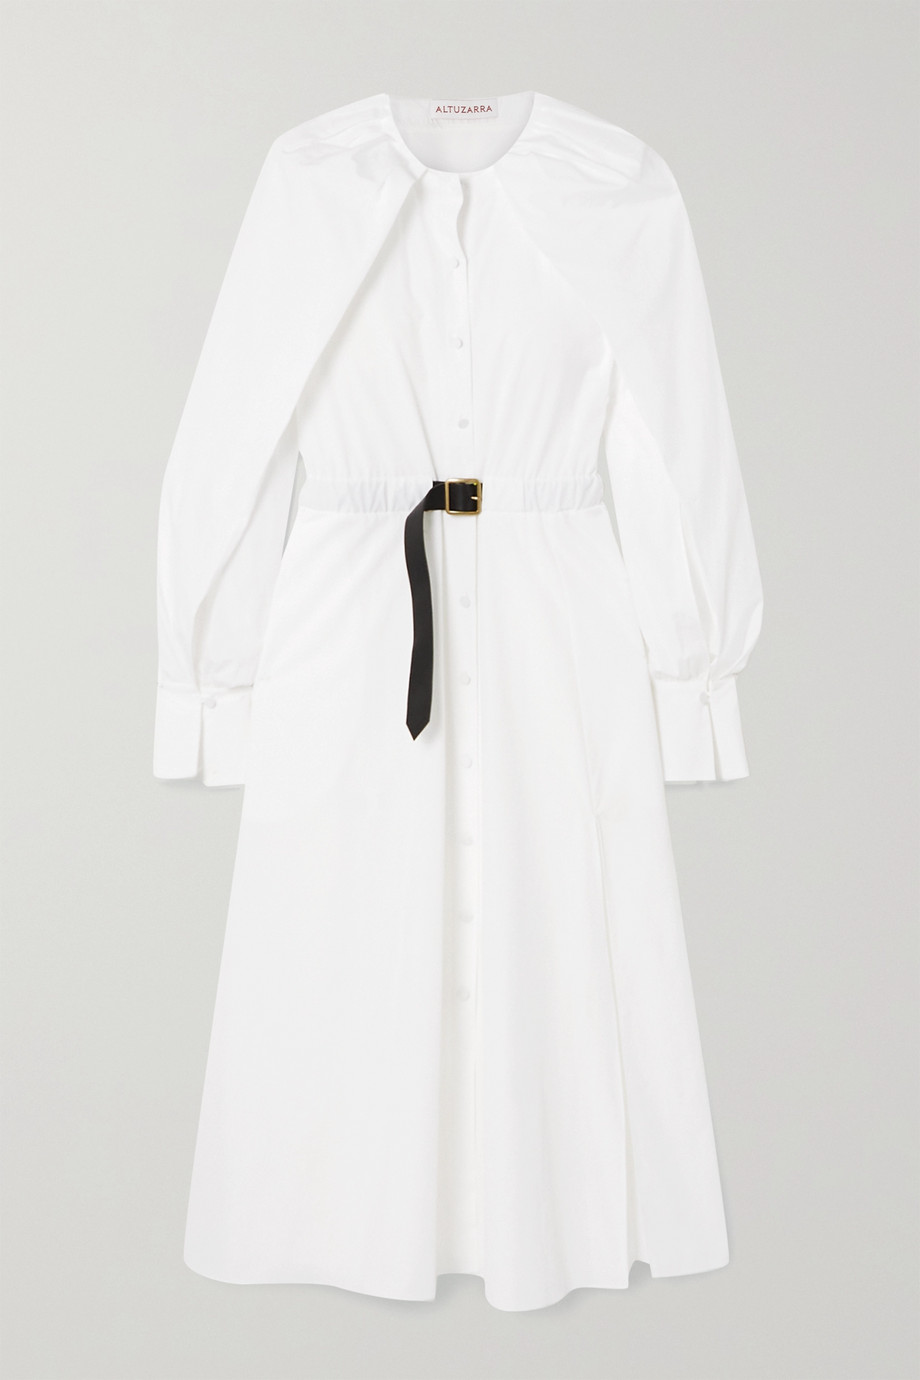 Altuzarra Liana buckled leather-trimmed cotton dress